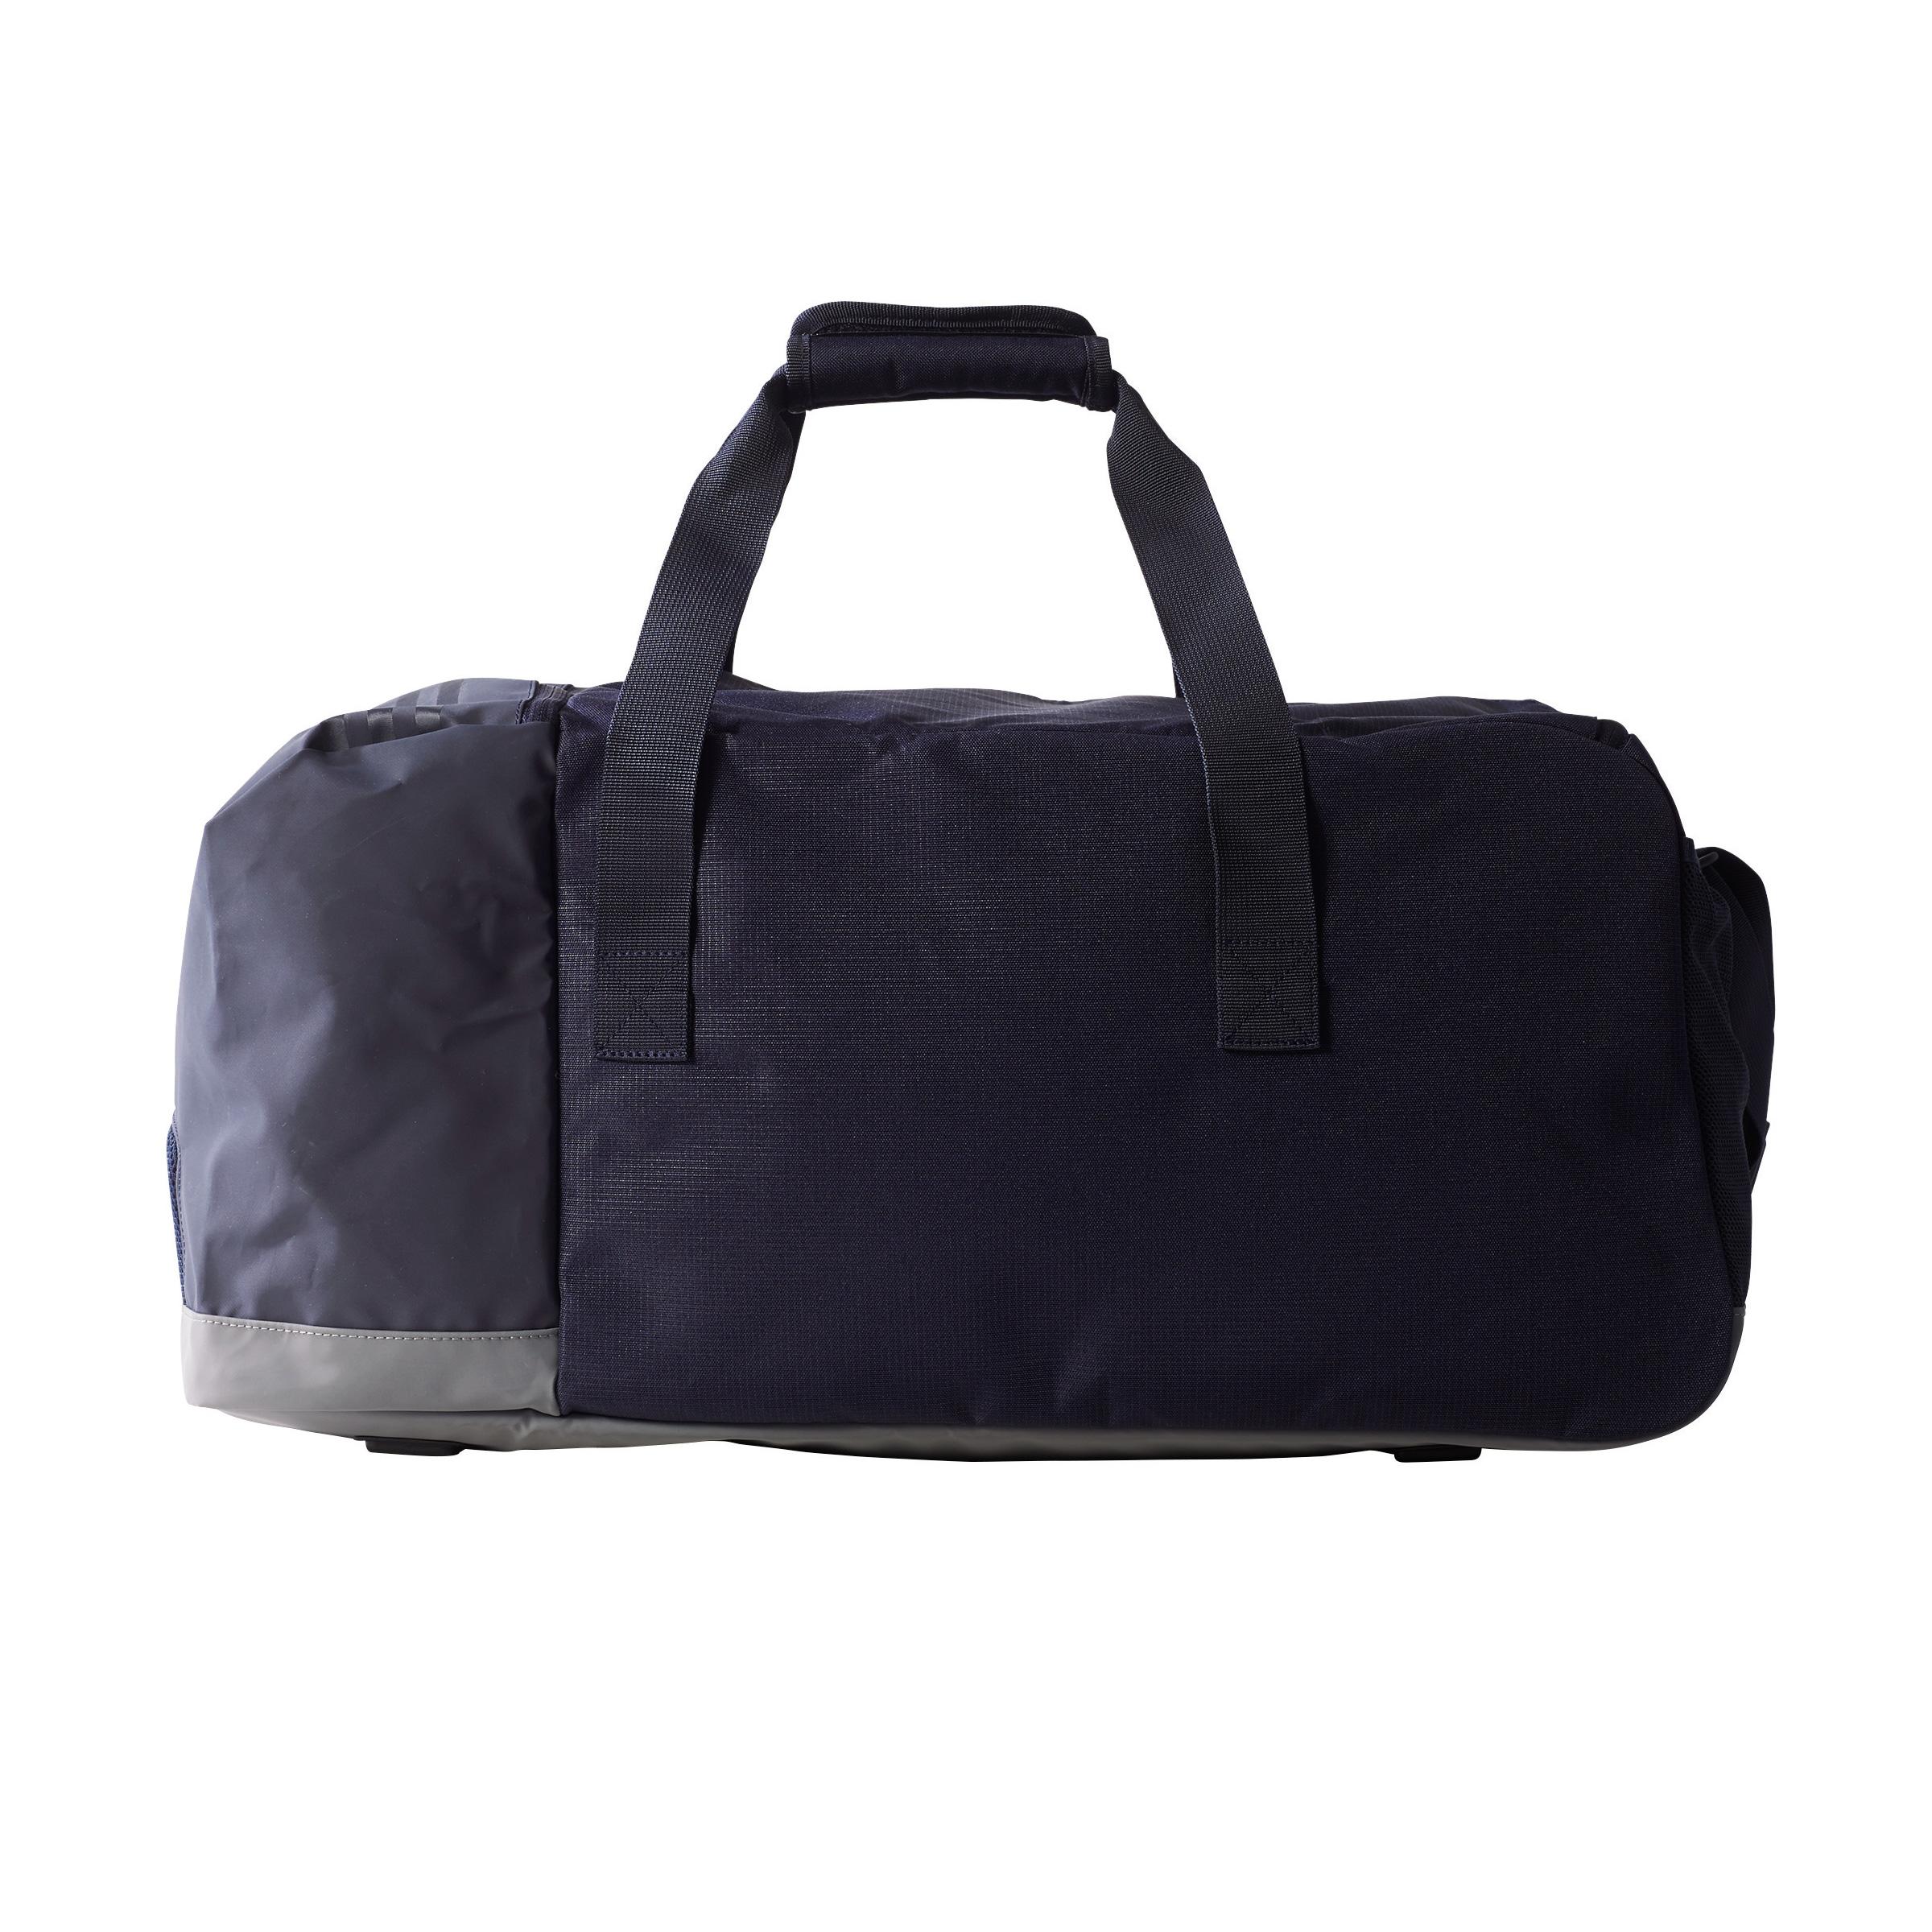 adidas tasche 3s performance teambag m blau herren damen. Black Bedroom Furniture Sets. Home Design Ideas